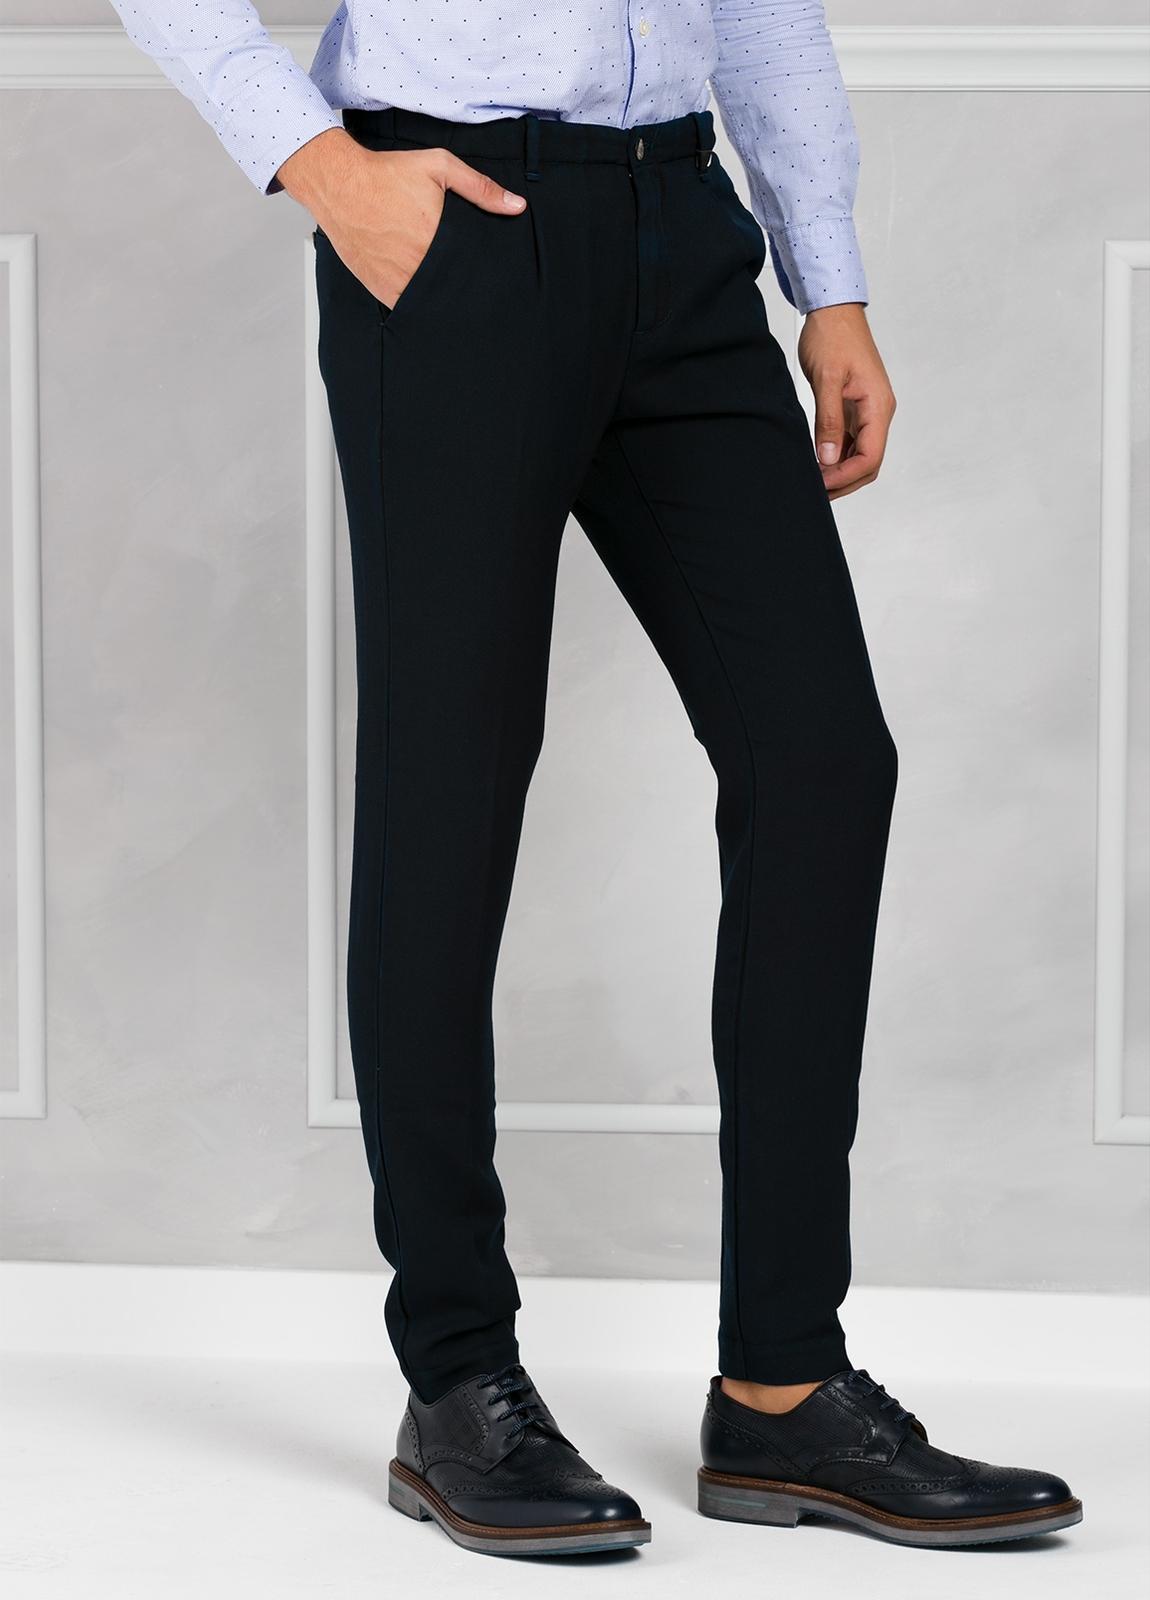 Pantalón sport Slim Fit con pliegues color azul marino. 100% Lana lavada. - Ítem2